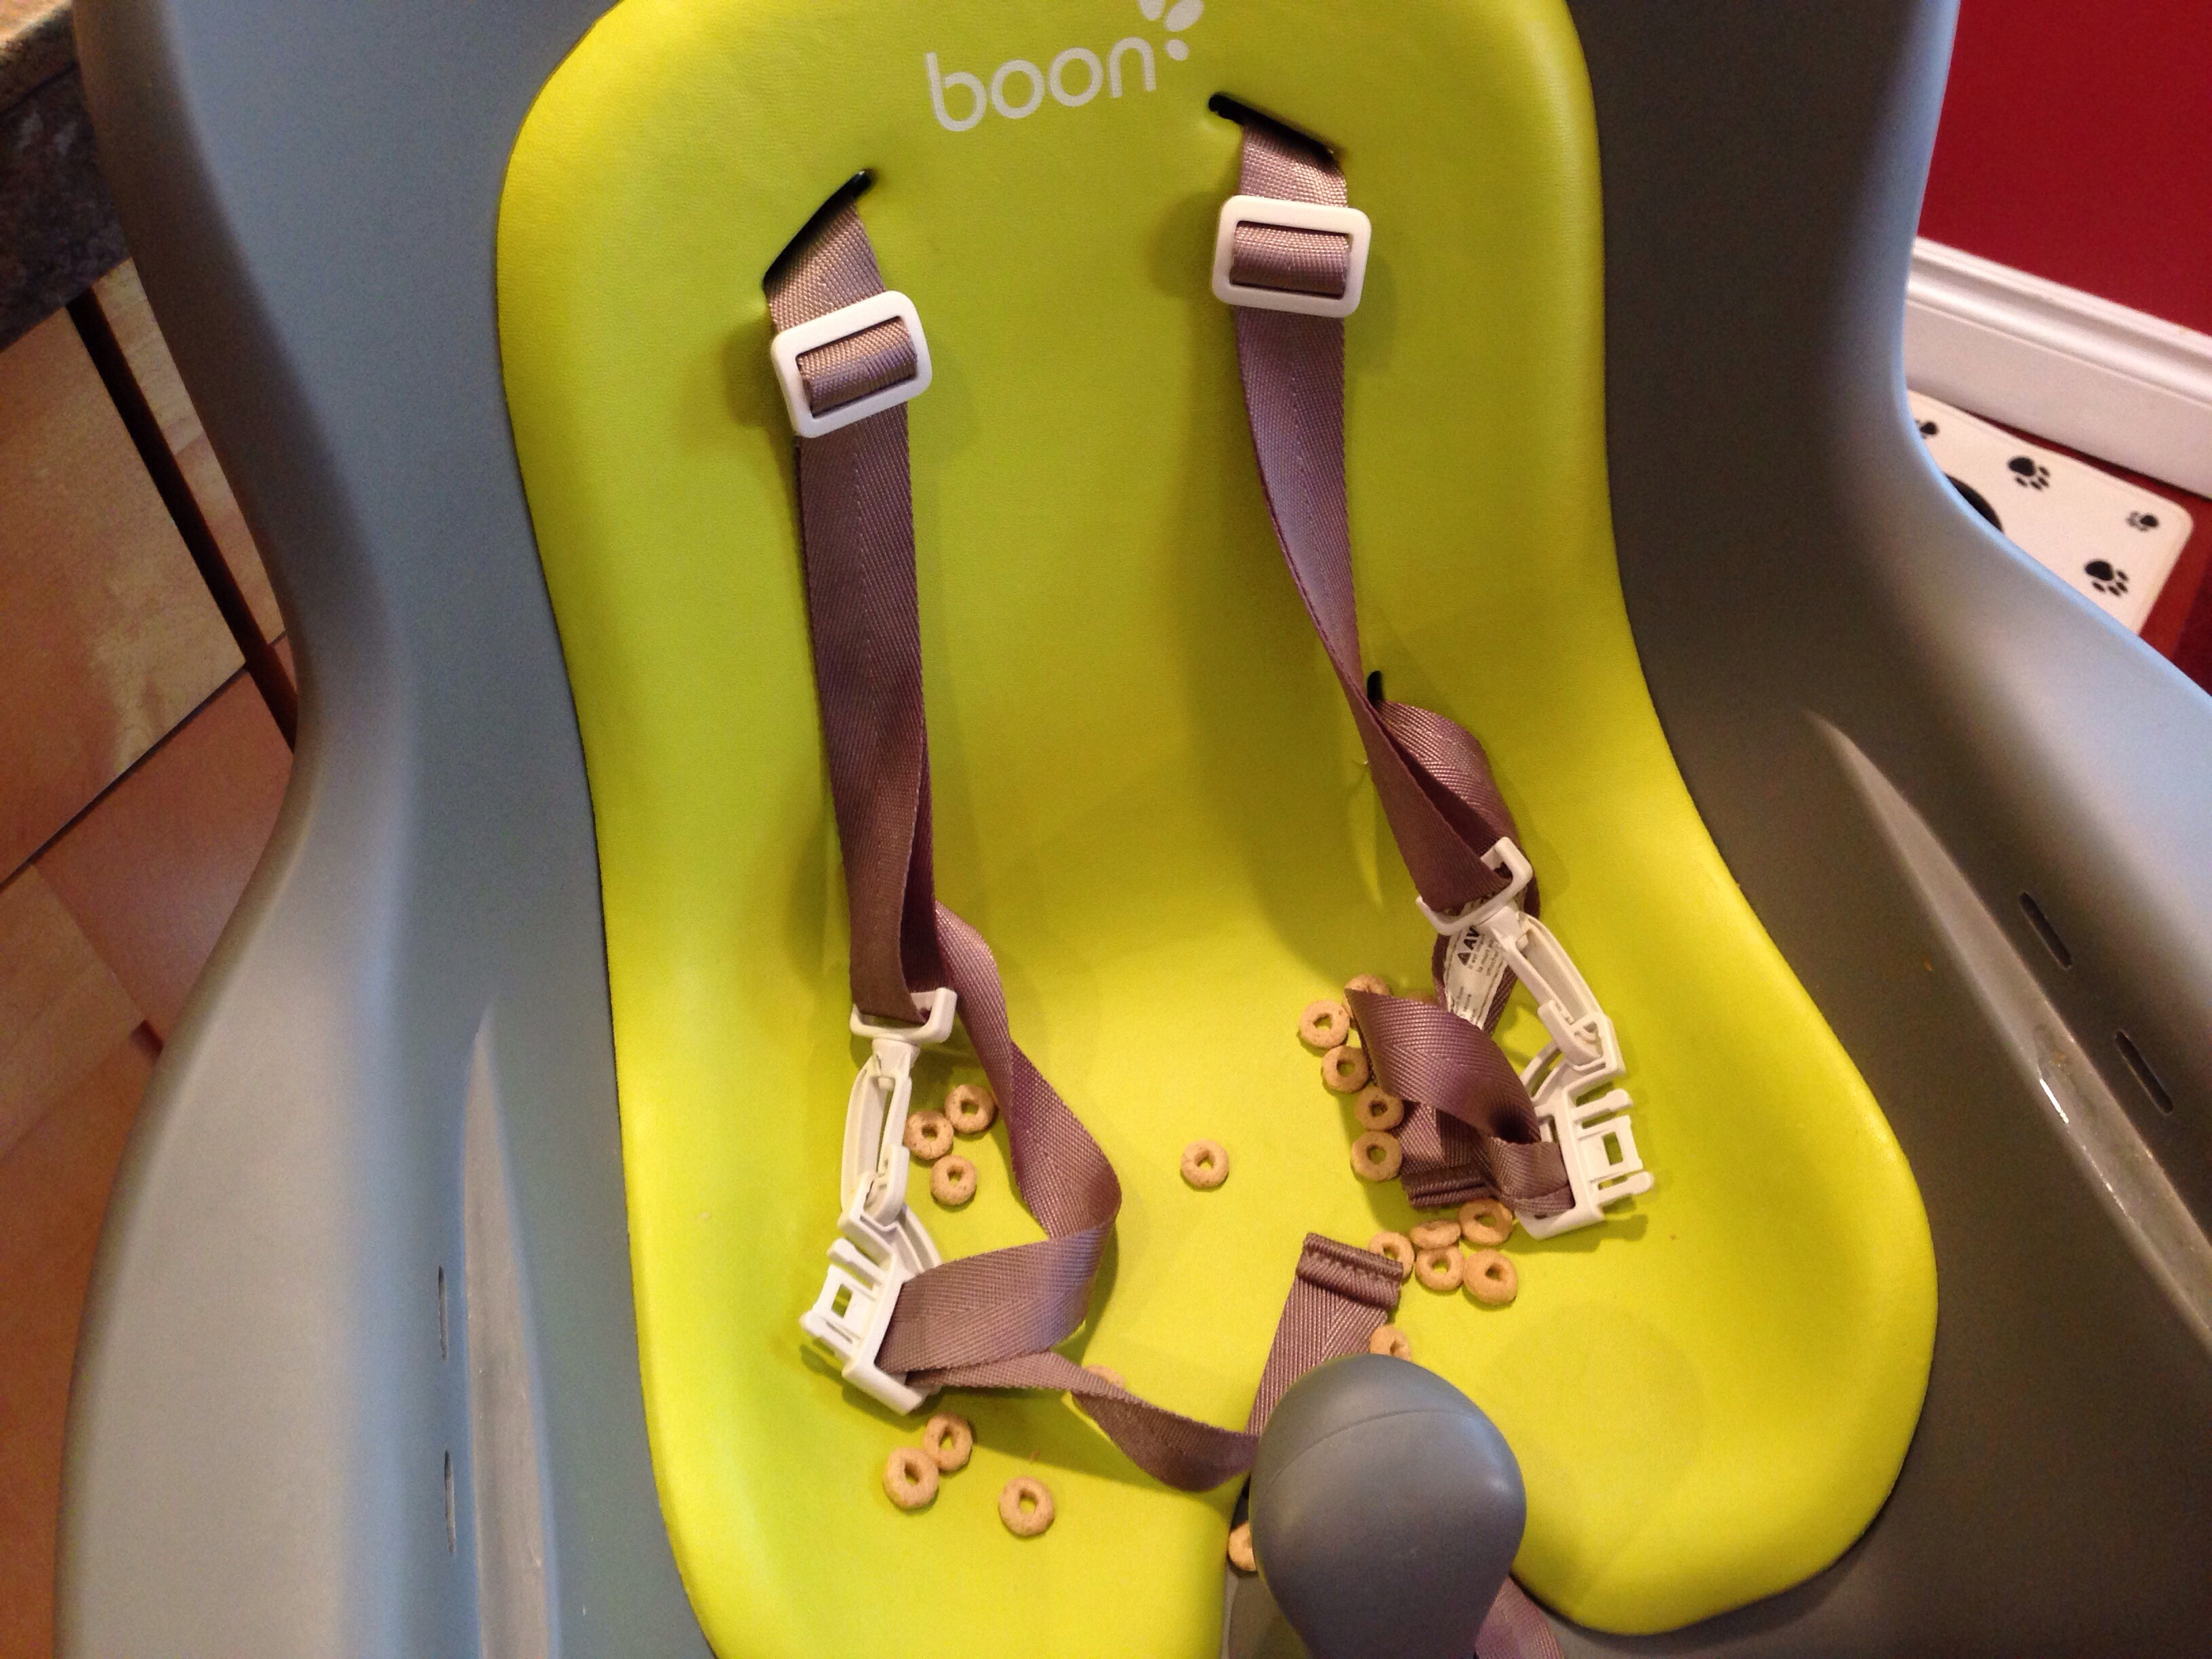 Boon S Flair High Chair Is Tops